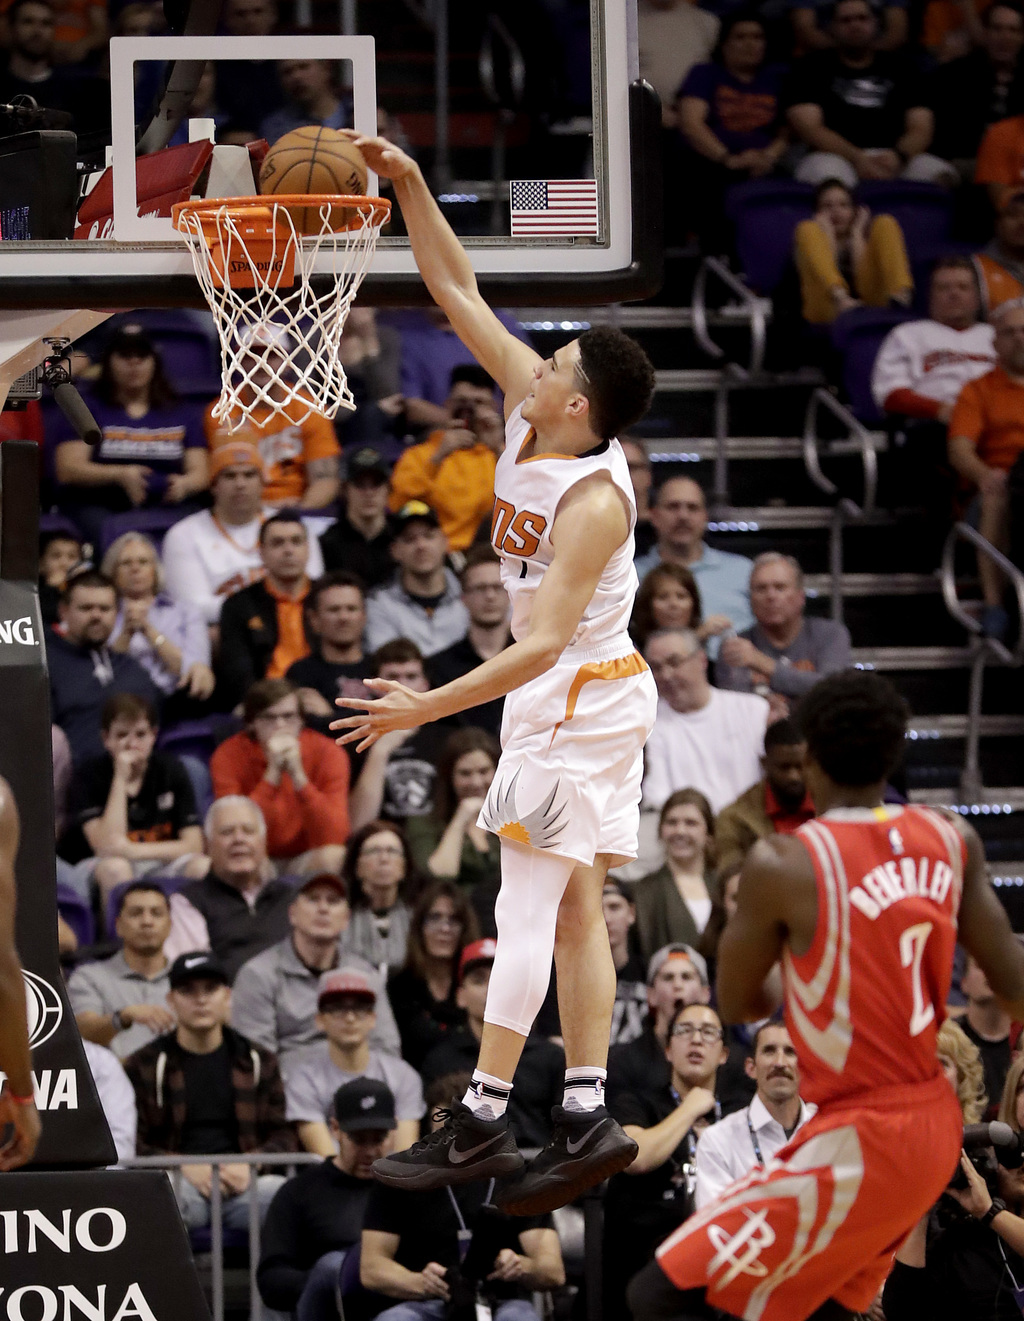 Phoenix Suns guard Devin Booker (1) dunks as Houston Rockets guard Patrick Beverley (2) watches during the first half of an NBA basketb...